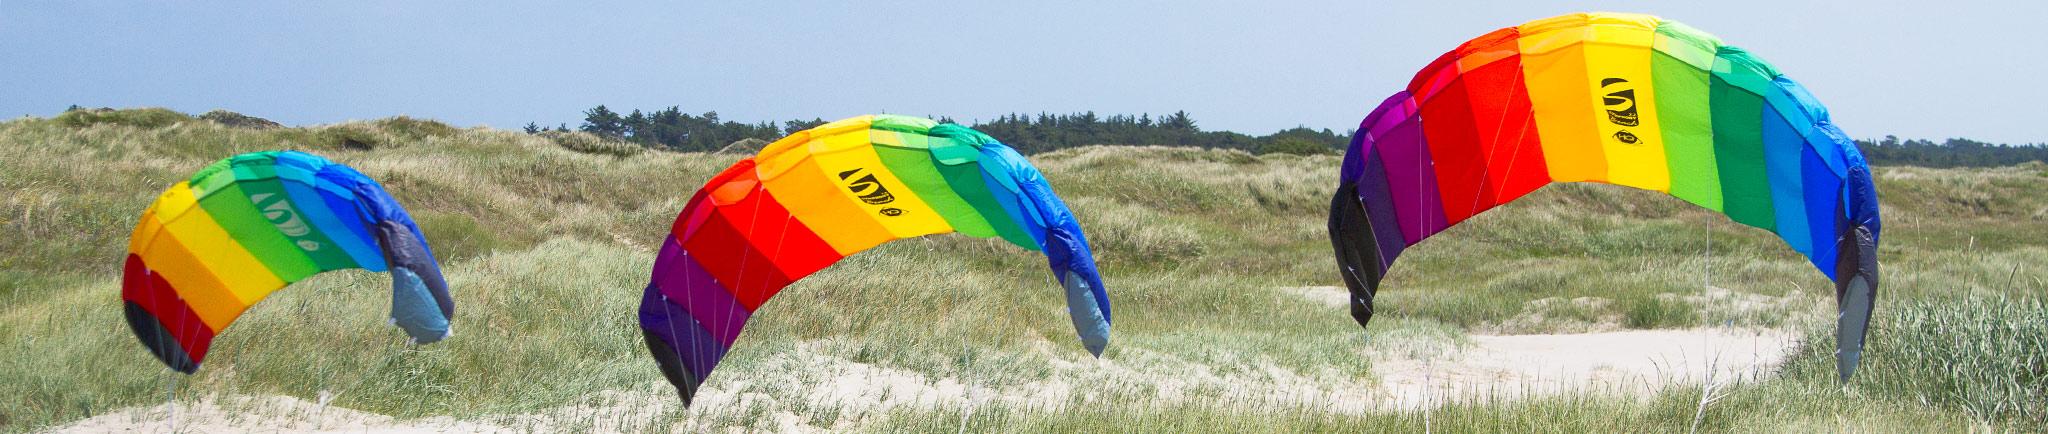 HQ Sport kite comparasion